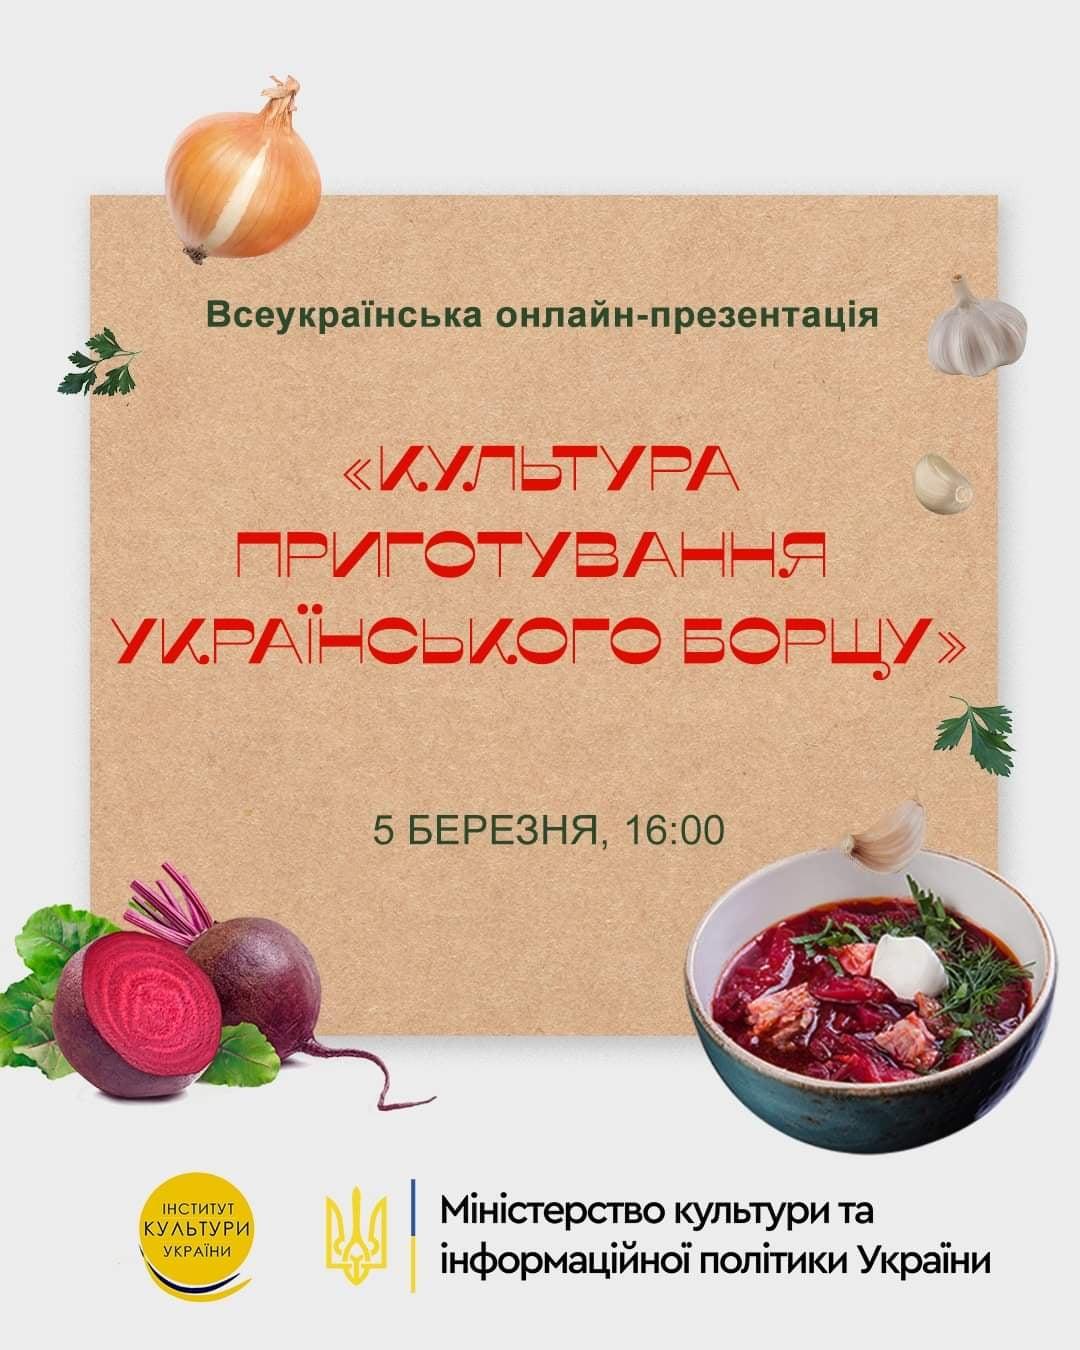 Борщ – українська страва